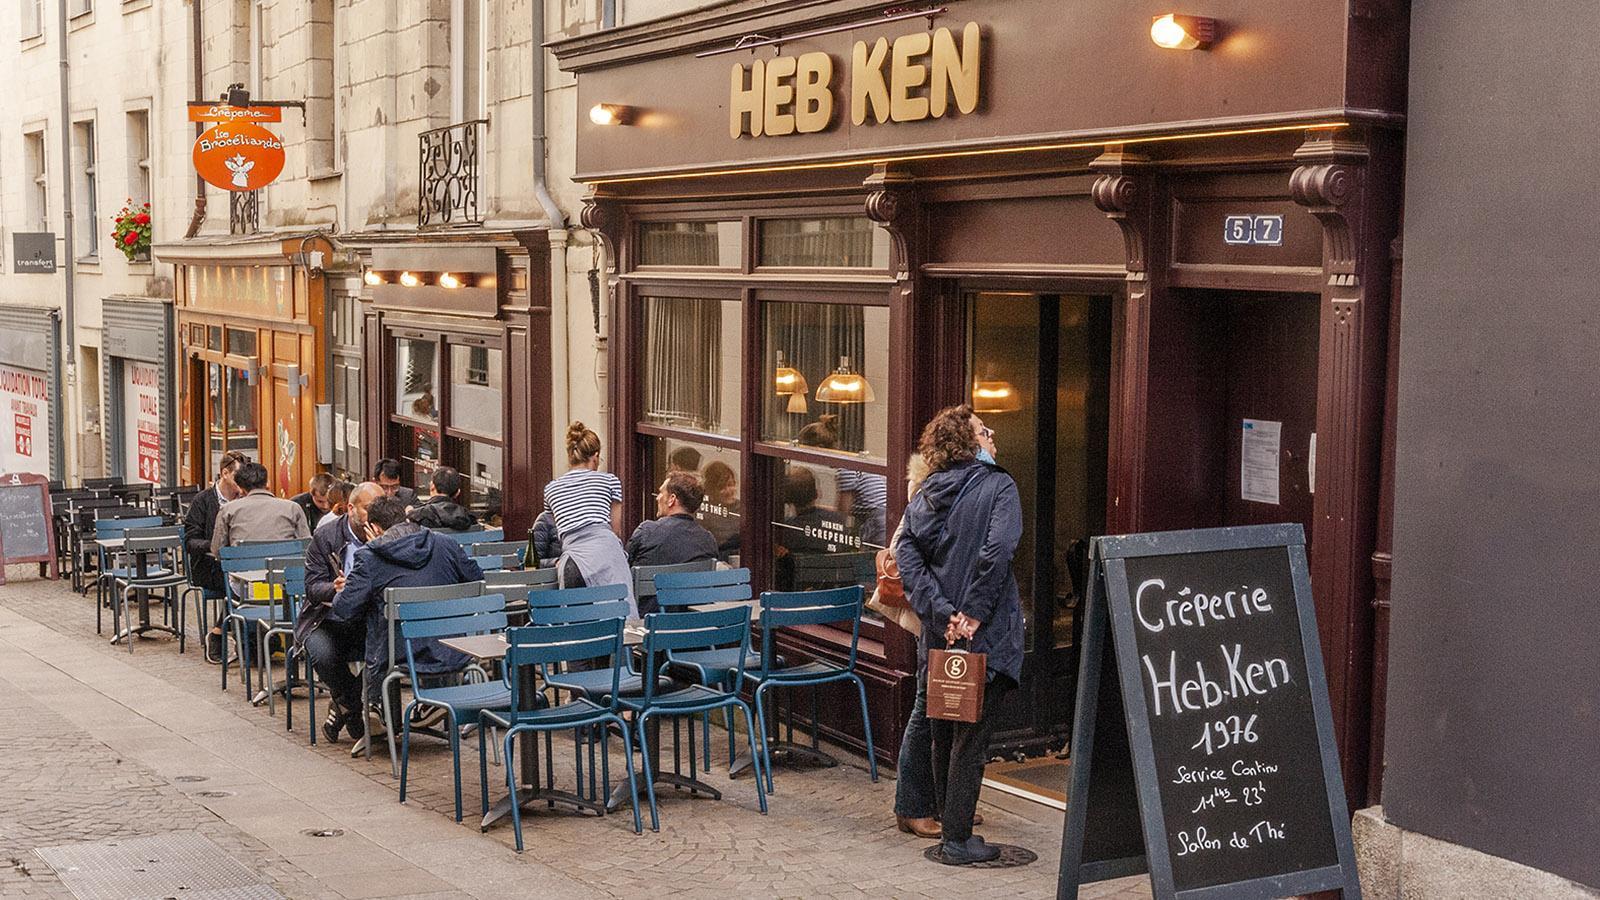 Nantes: Creperie Heb Ken. Foto: Hilke Maunder